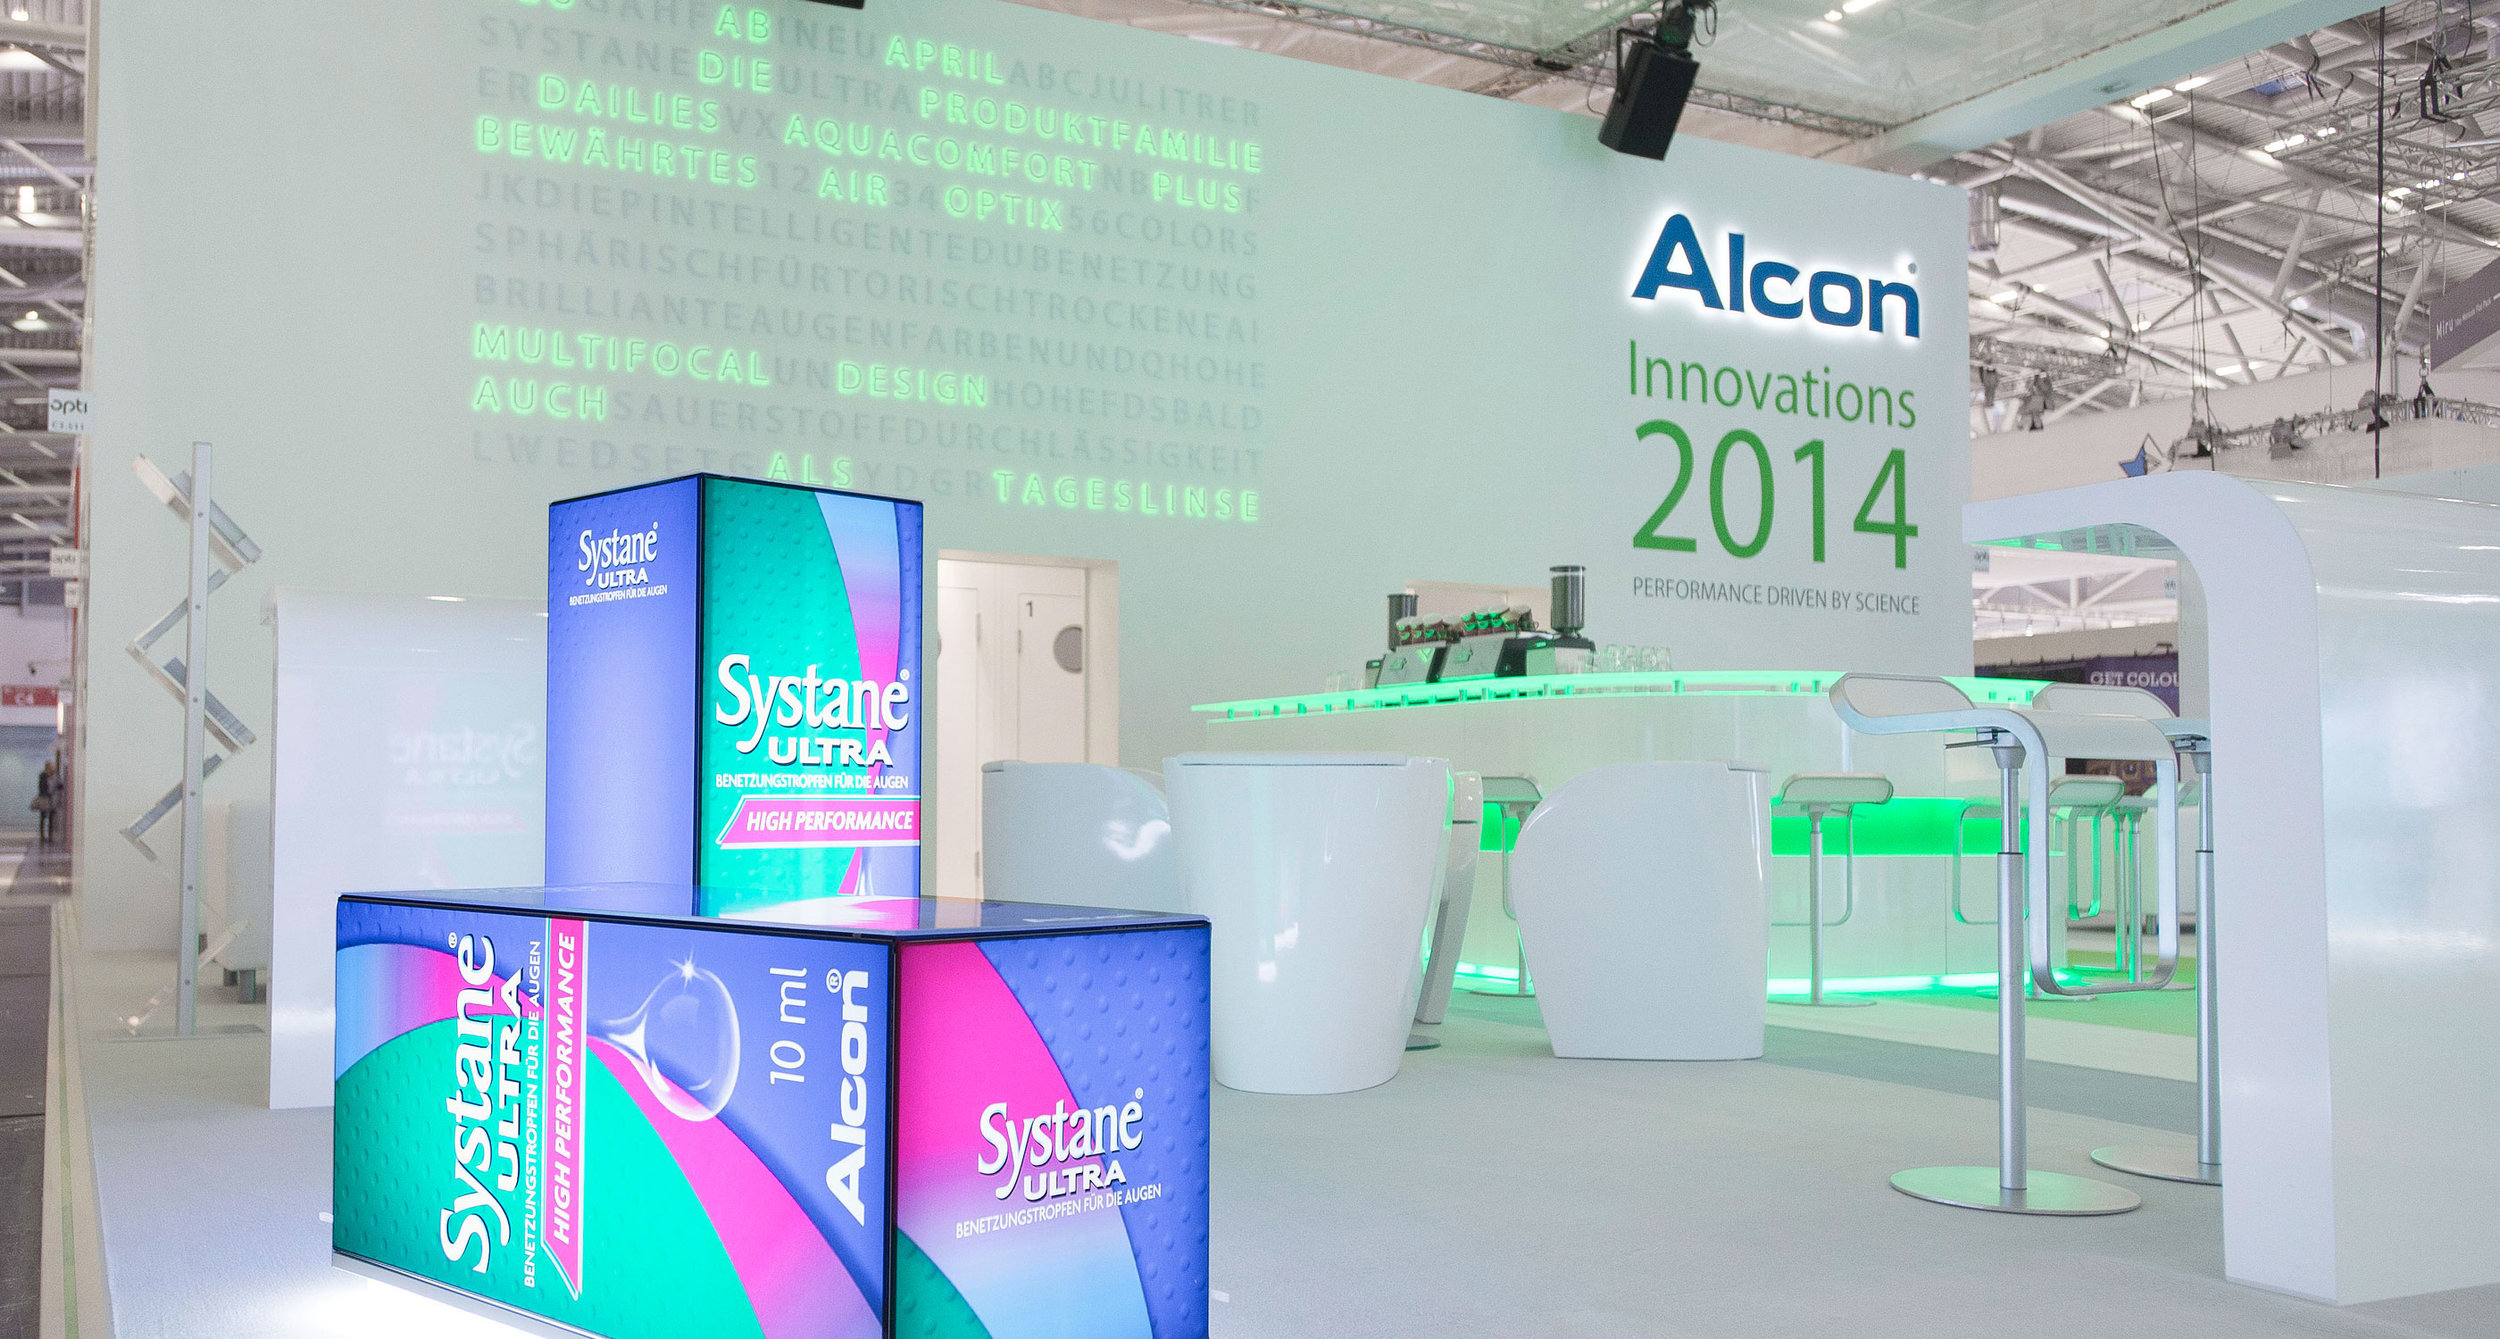 Innovations. - BBS — Alcon Pharma